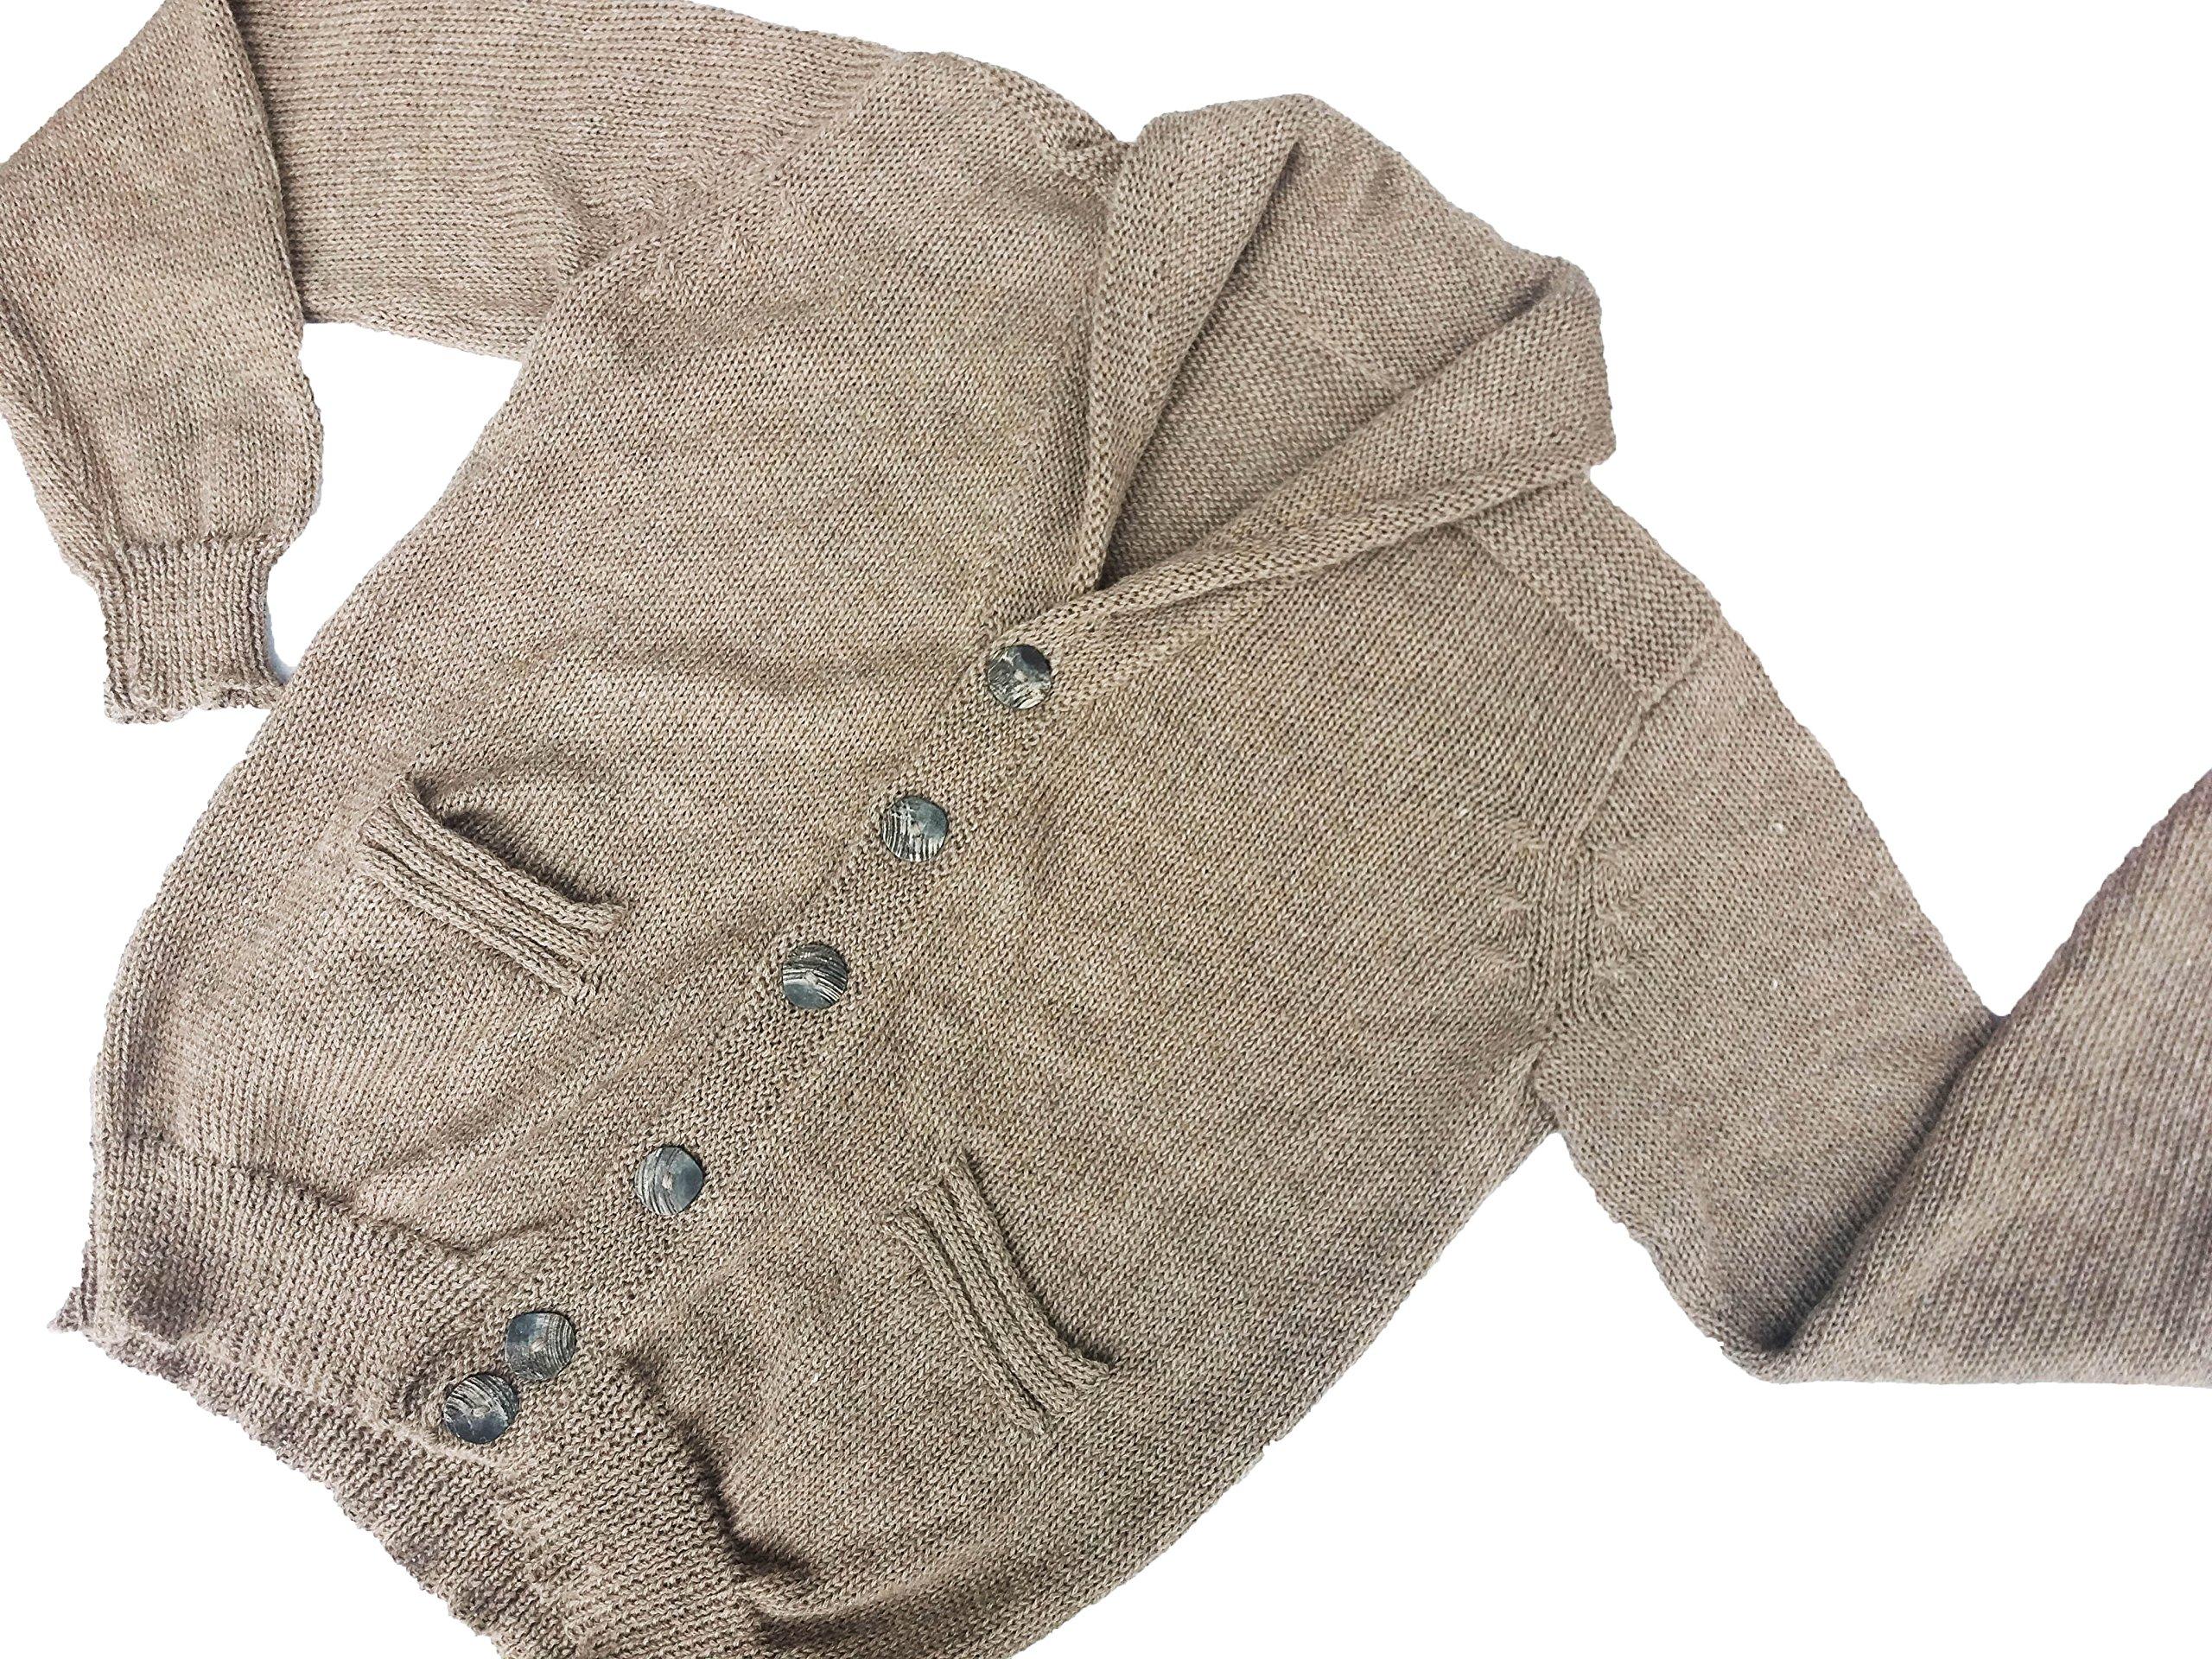 Sweet Dreams Home 100% Peruvian Royal Alpaca Charcoal Shawl Collar Cardigan, Natural Beige XL